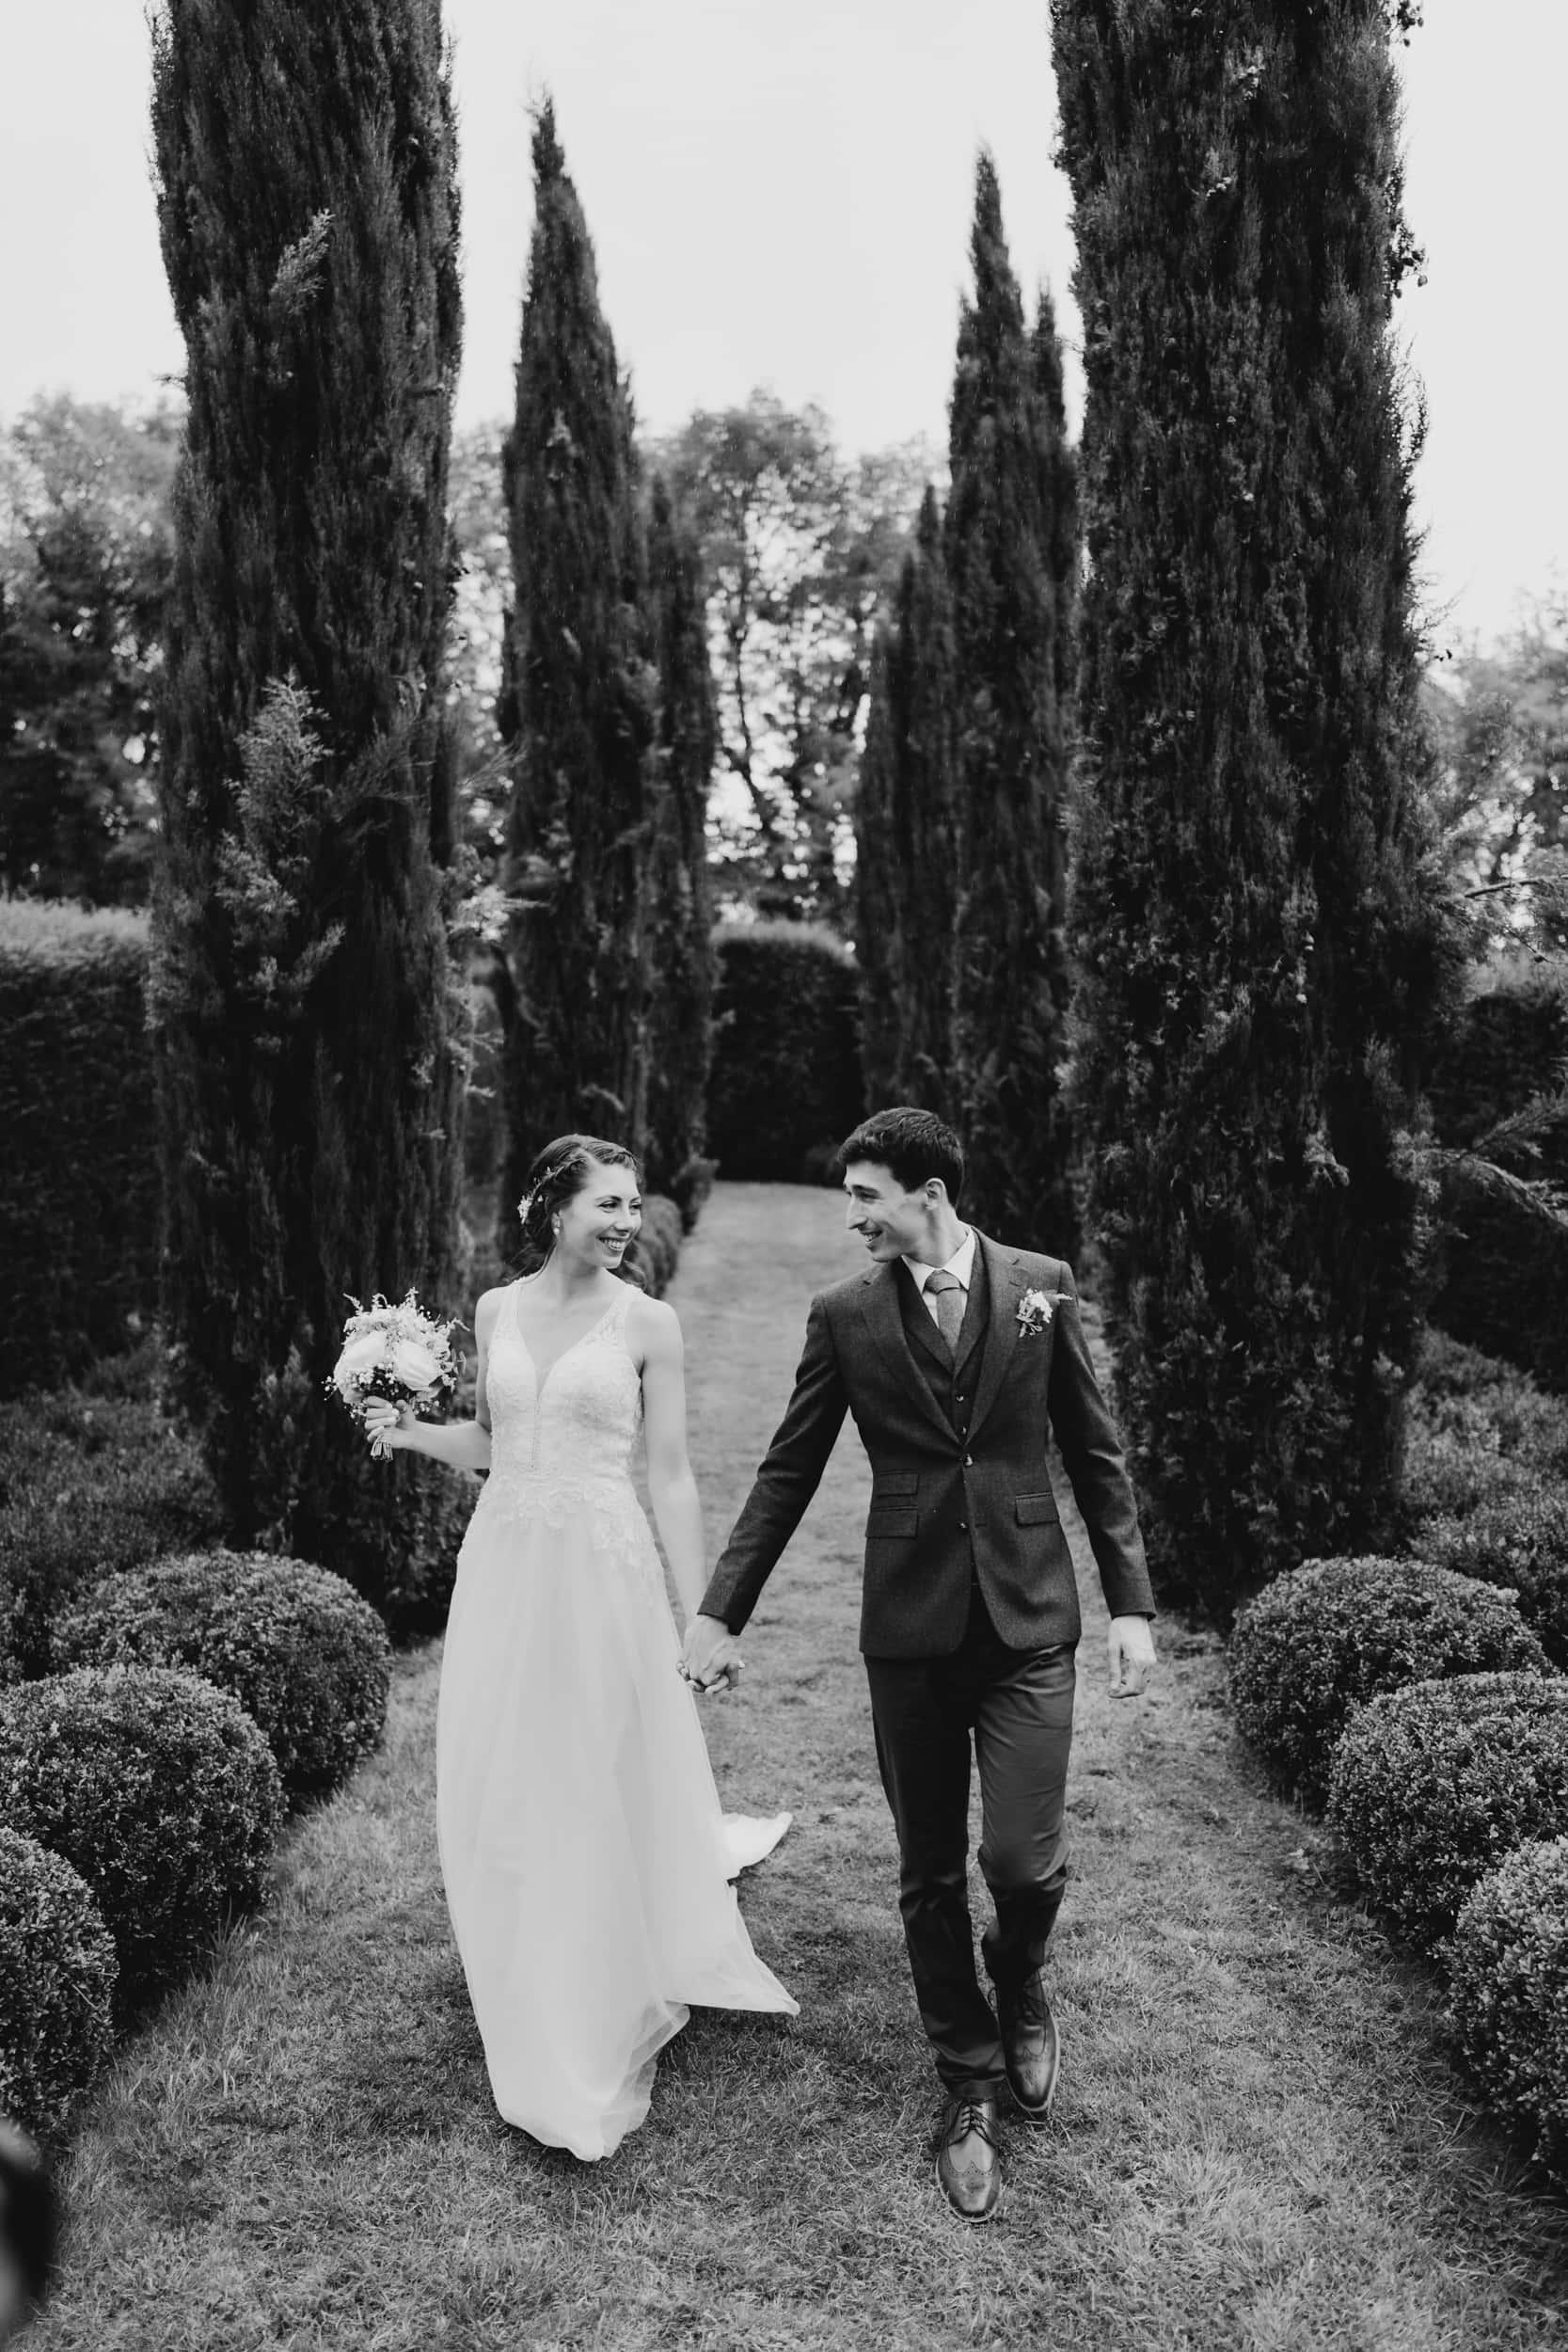 couple walking through garden on wedding day